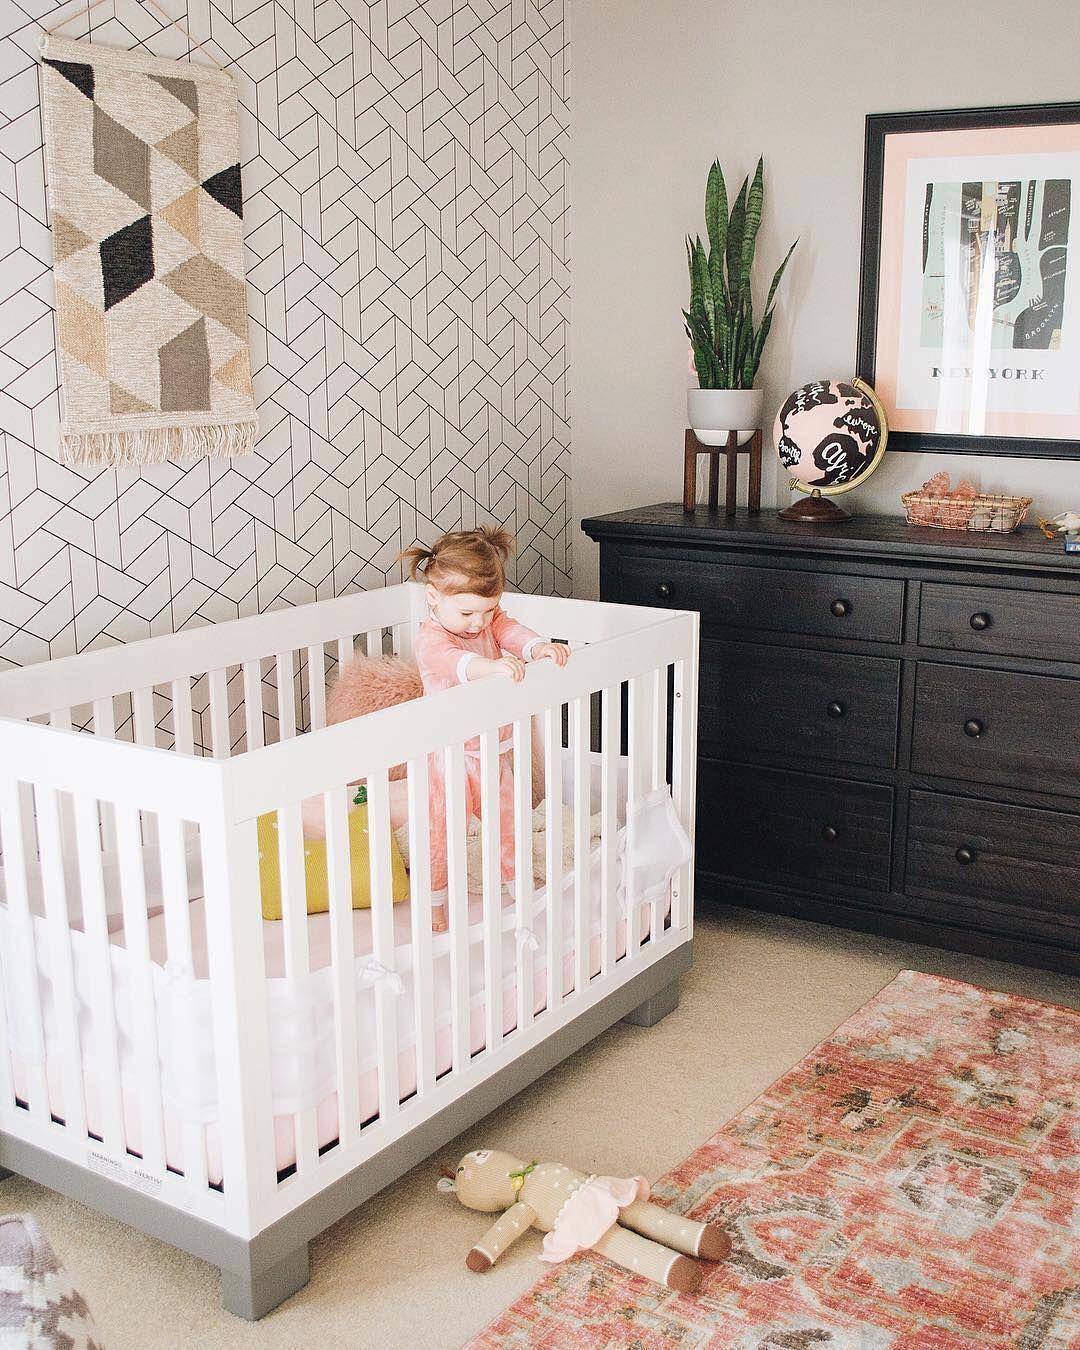 Modern Nursery Wallpaper: Eyeing That Amazing Tessellation Pattern • #babyletto Modo